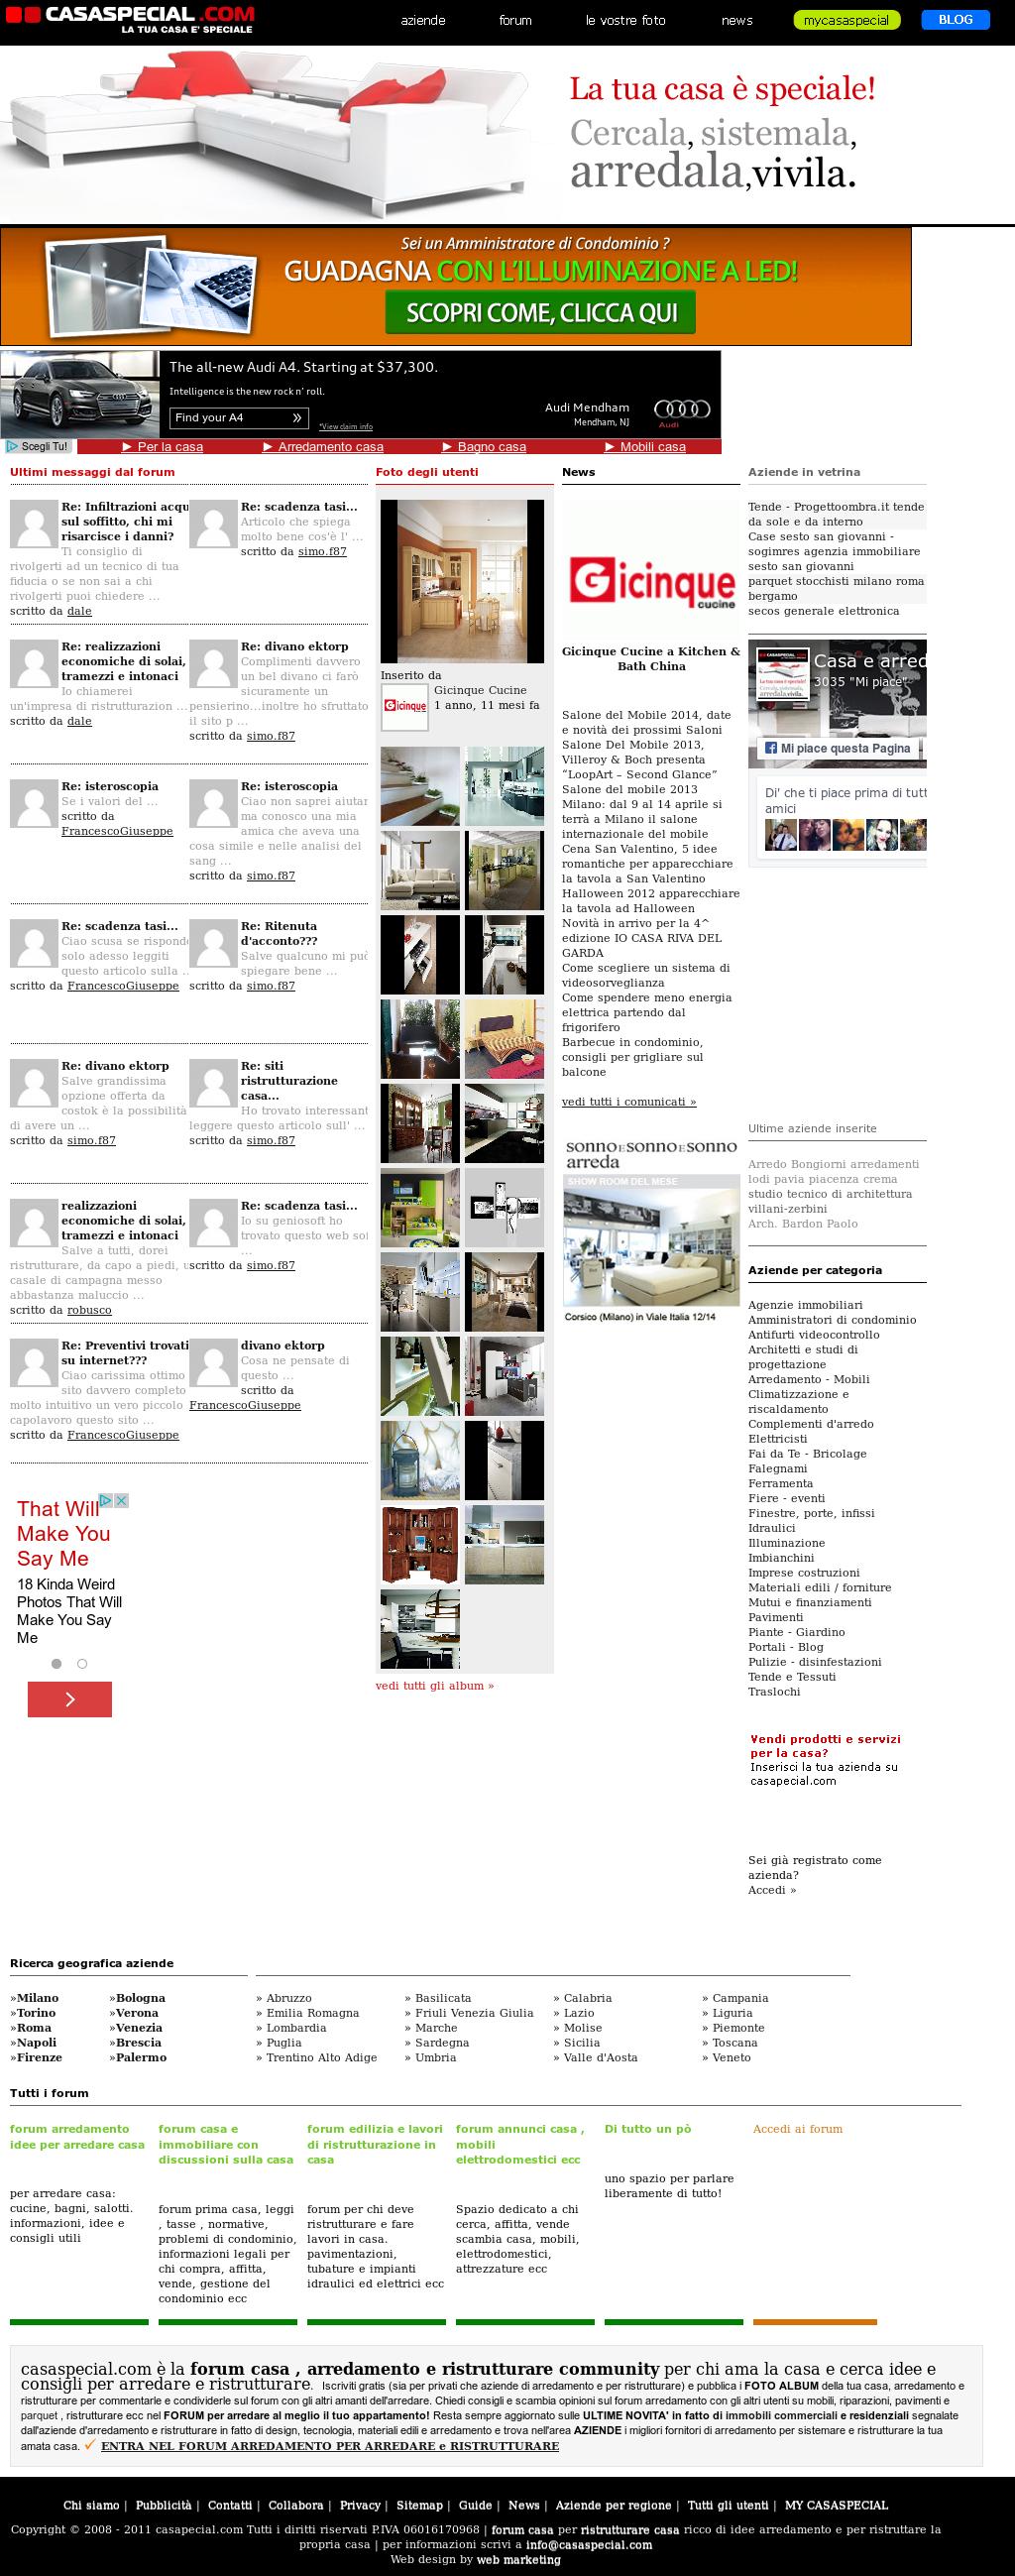 Arredamento Casa Roma casa e arredamento competitors, revenue and employees